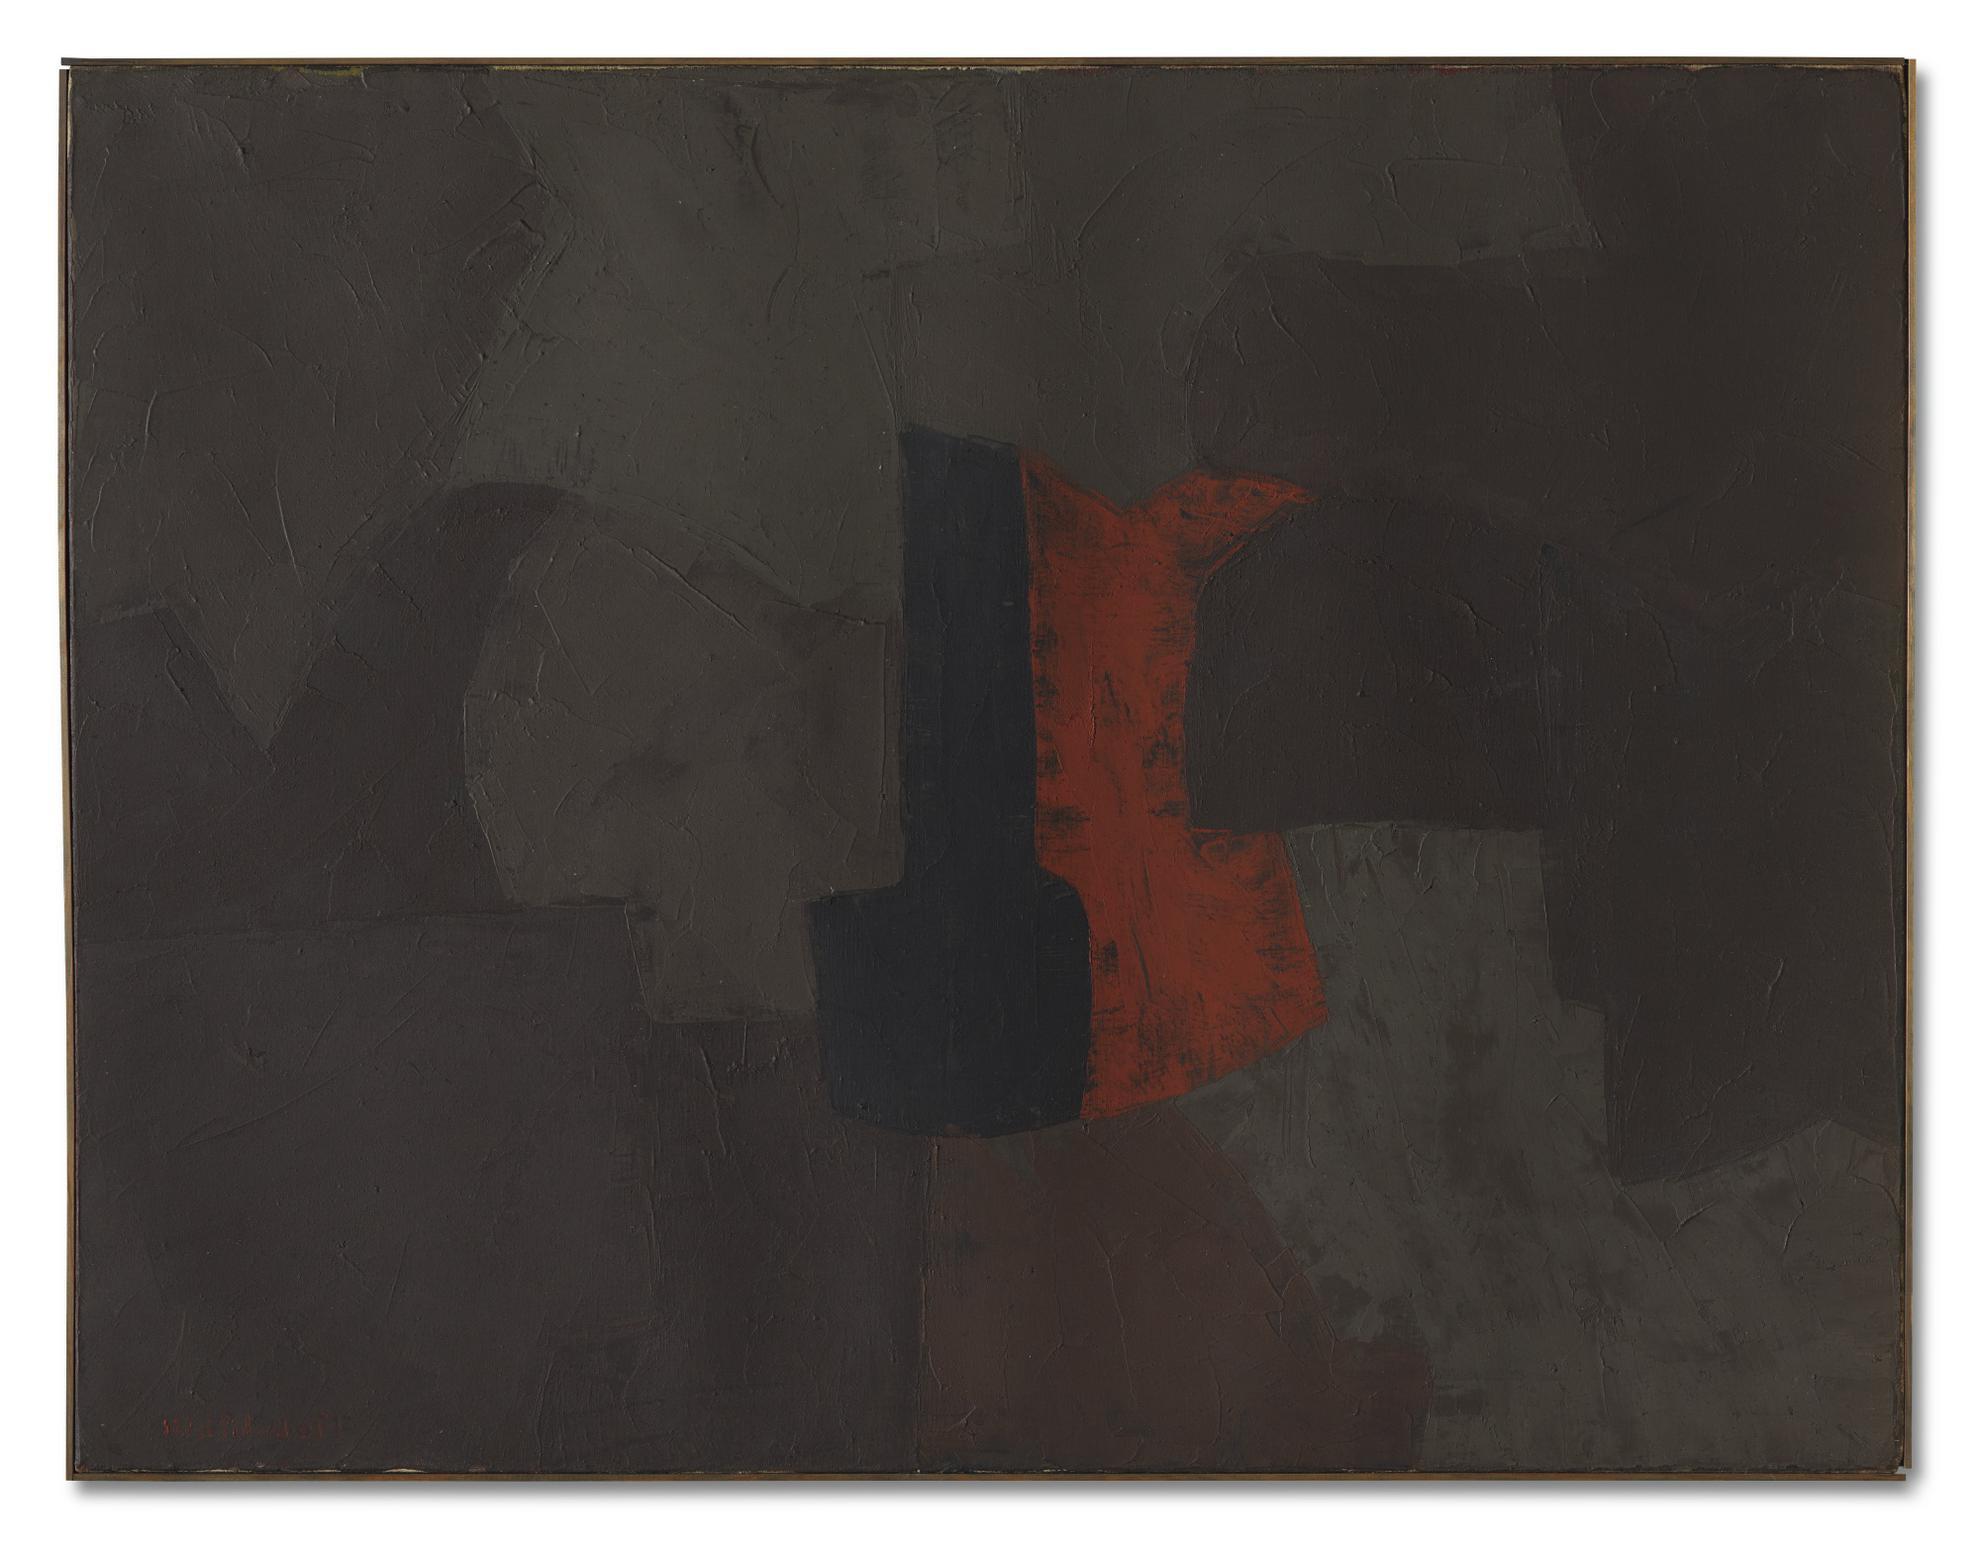 Serge Poliakoff-Gris Brun Noir Rouge-1956